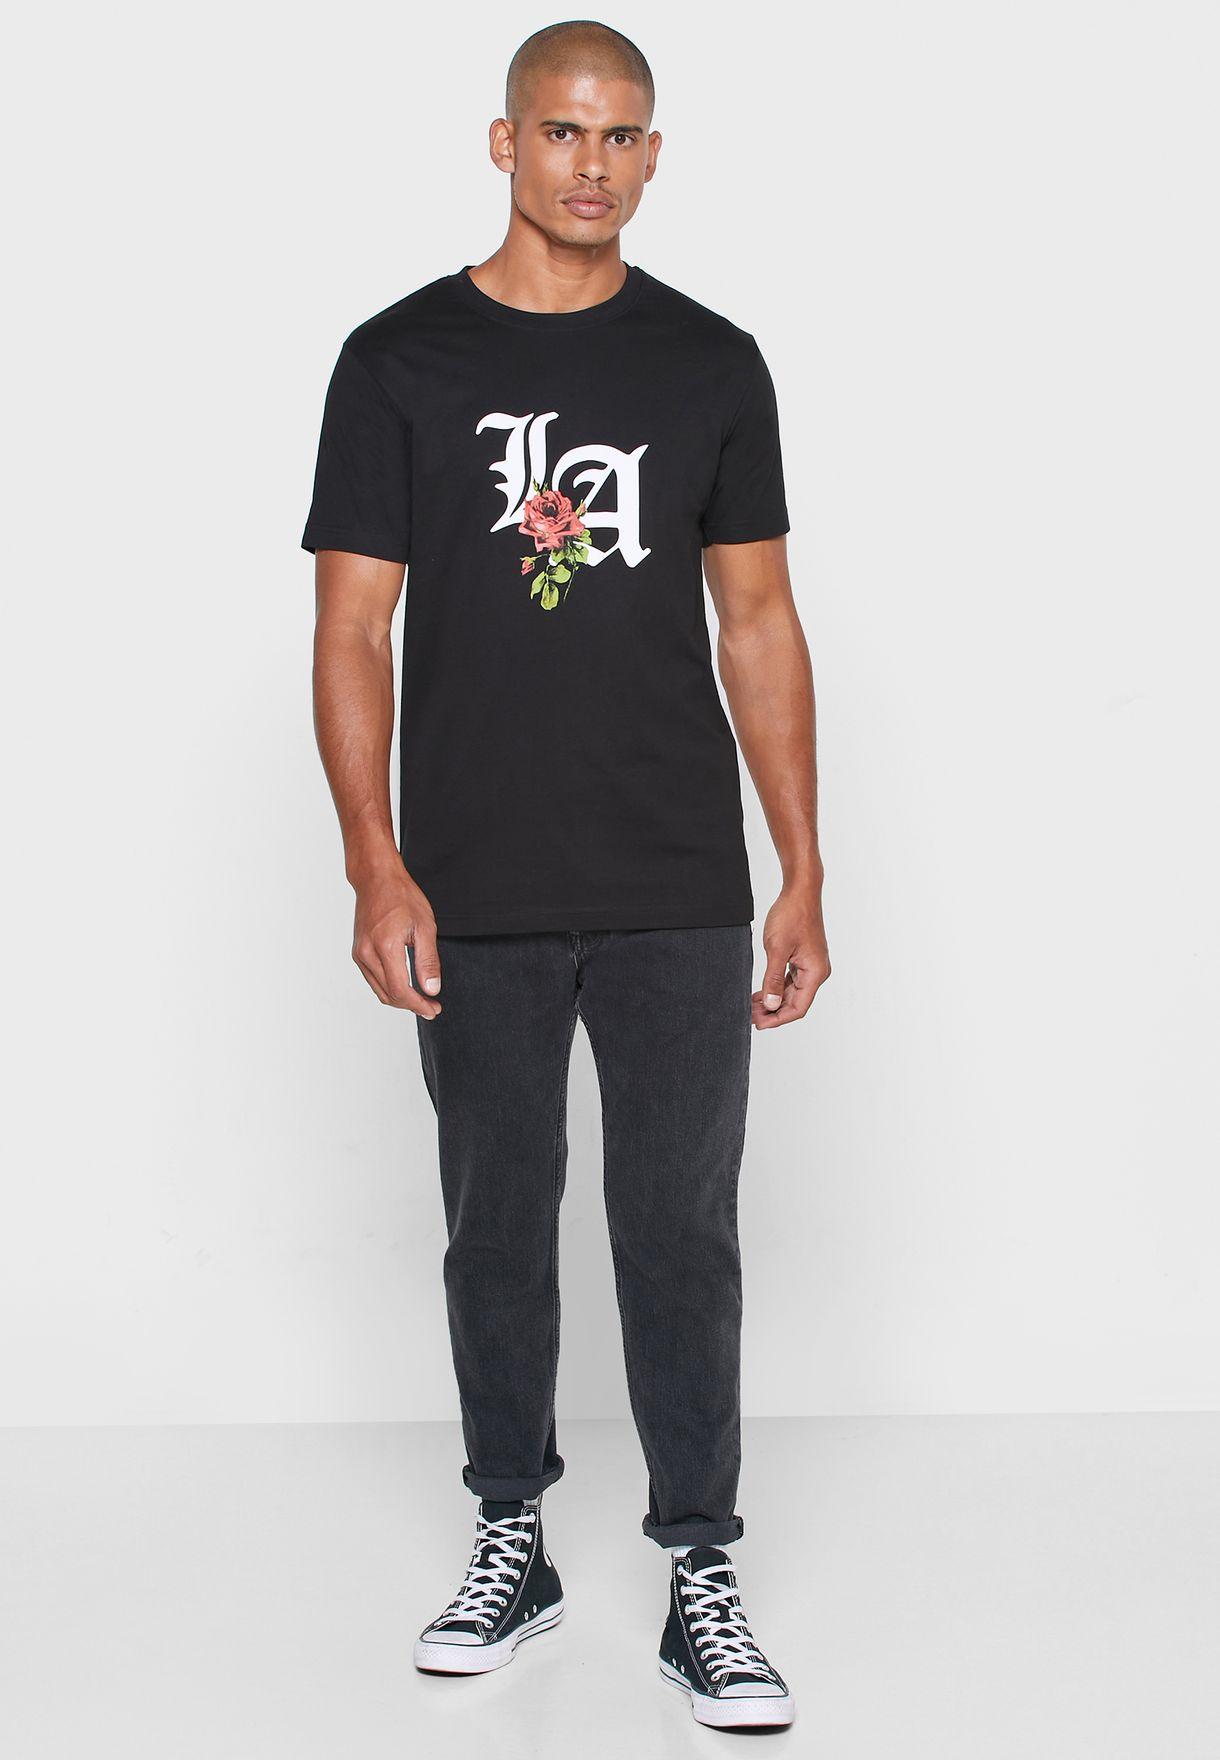 LA Rose T-Shirt